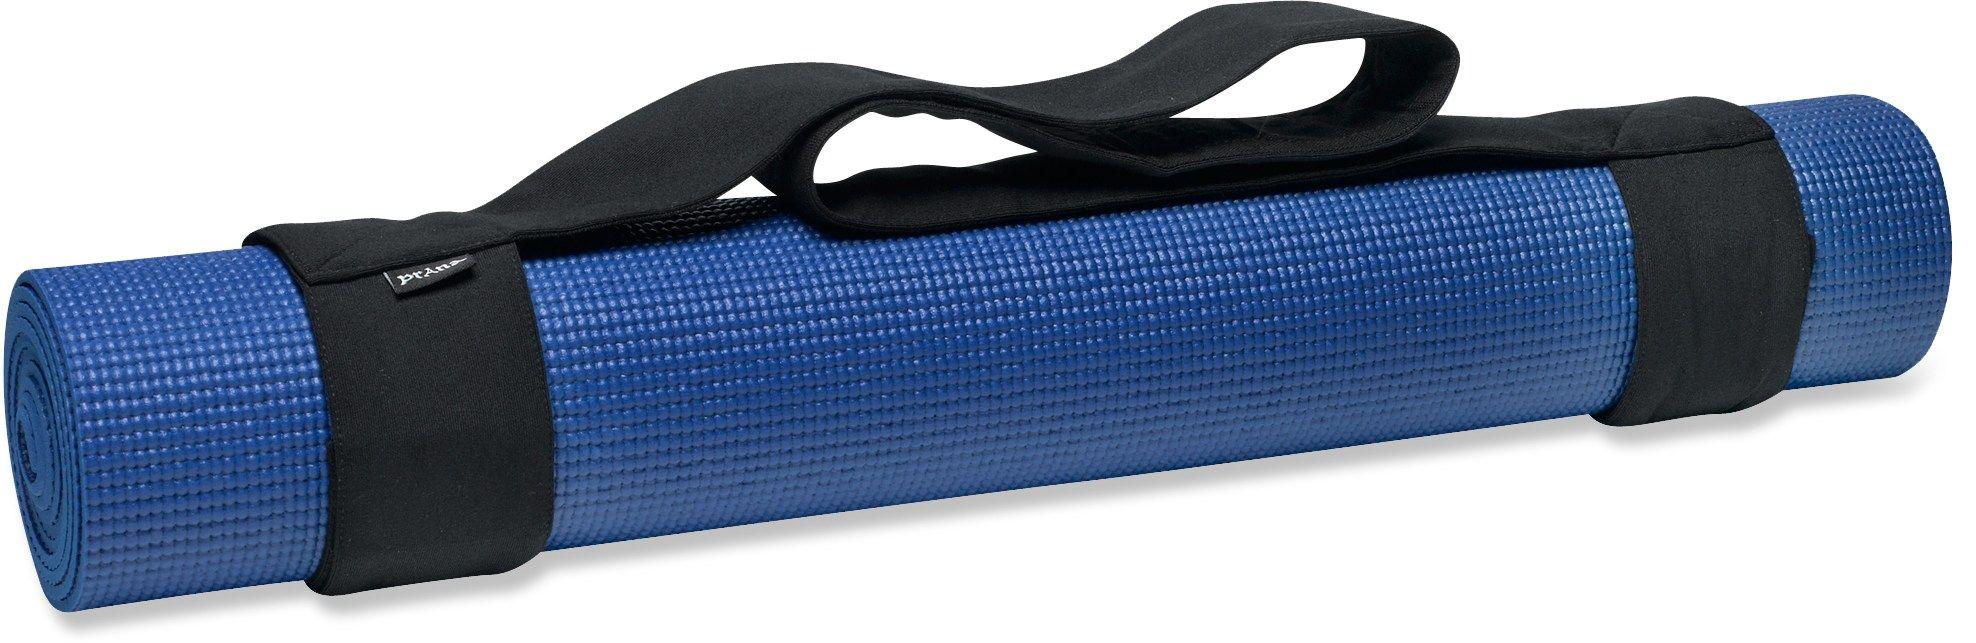 Prana Tote Yoga Mat Holder